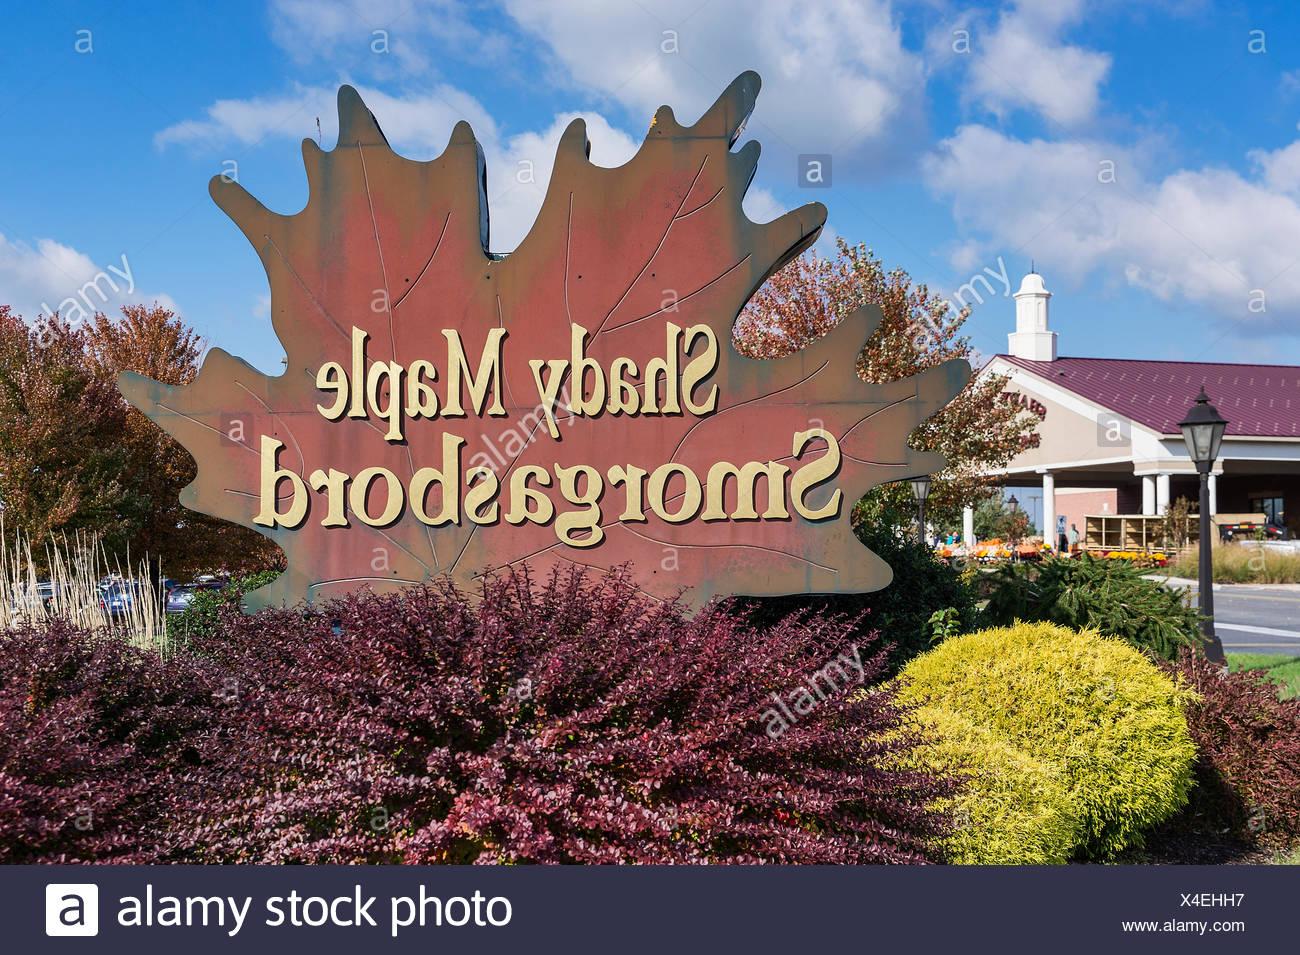 Shady Maple Smorgasbord, East Earl, Lancaster, Pennsylvania, USA Stock Photo